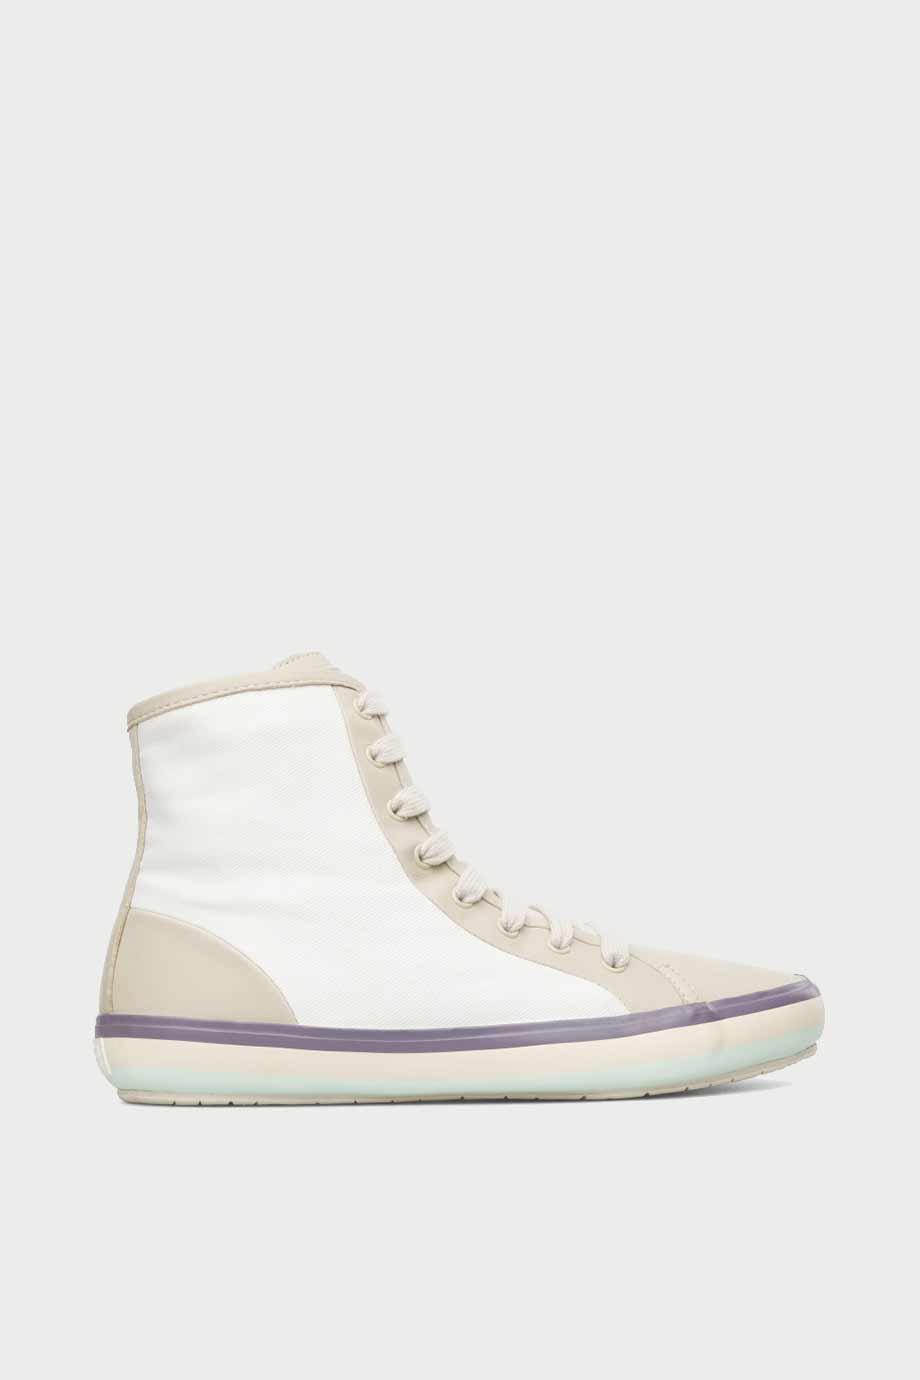 spiridoula metheniti shoes xalkida p .Camper 46706 005 Portoljpg 2